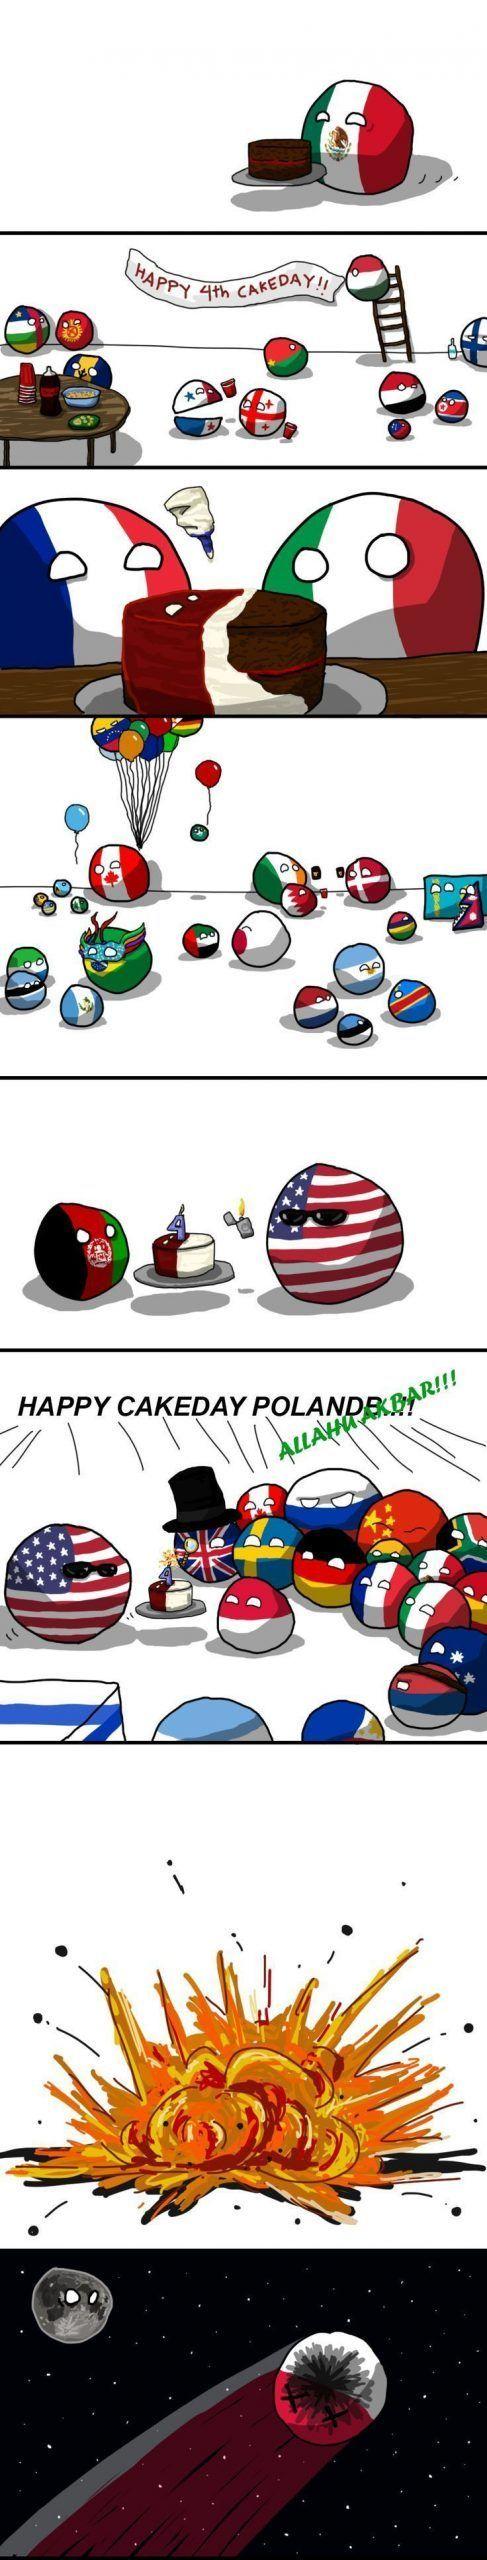 Happy 4th Anniversary Meme